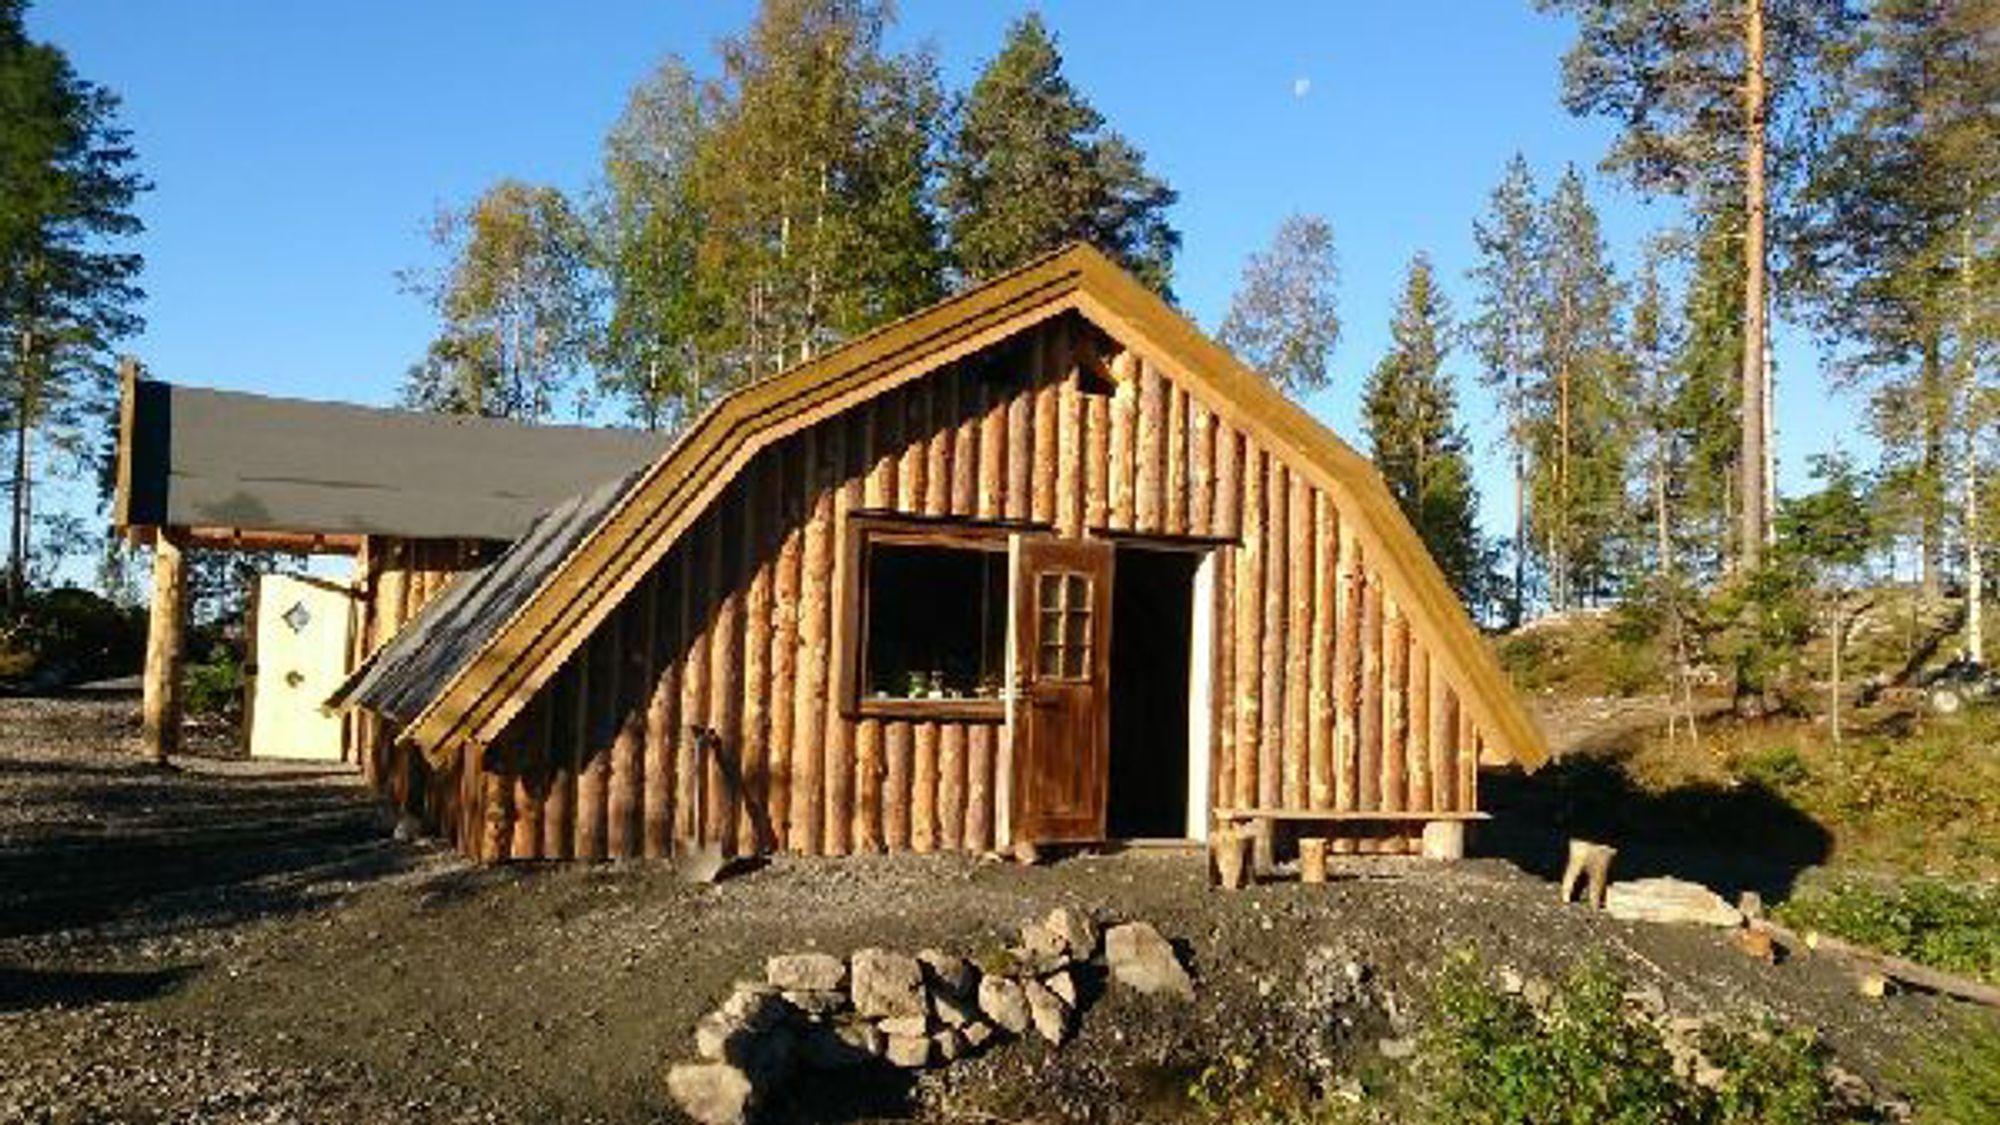 Naturavdelingen til Ole Brumm barnehage i Aurskog har tilhold i et vikingehus.